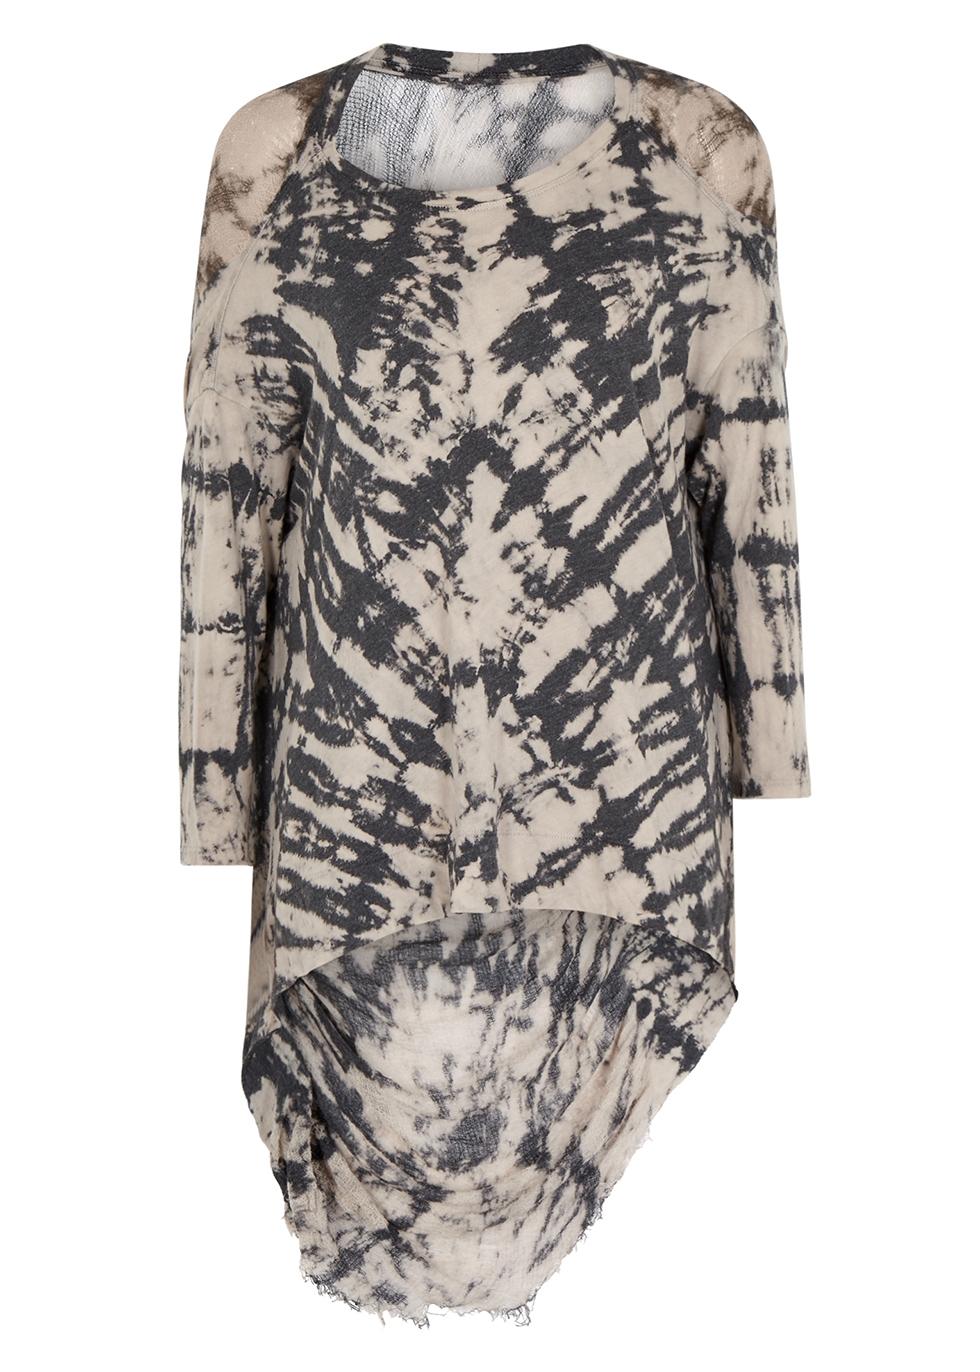 Charcoal tie-dye cotton-blend T-shirt - RAQUEL ALLEGRA